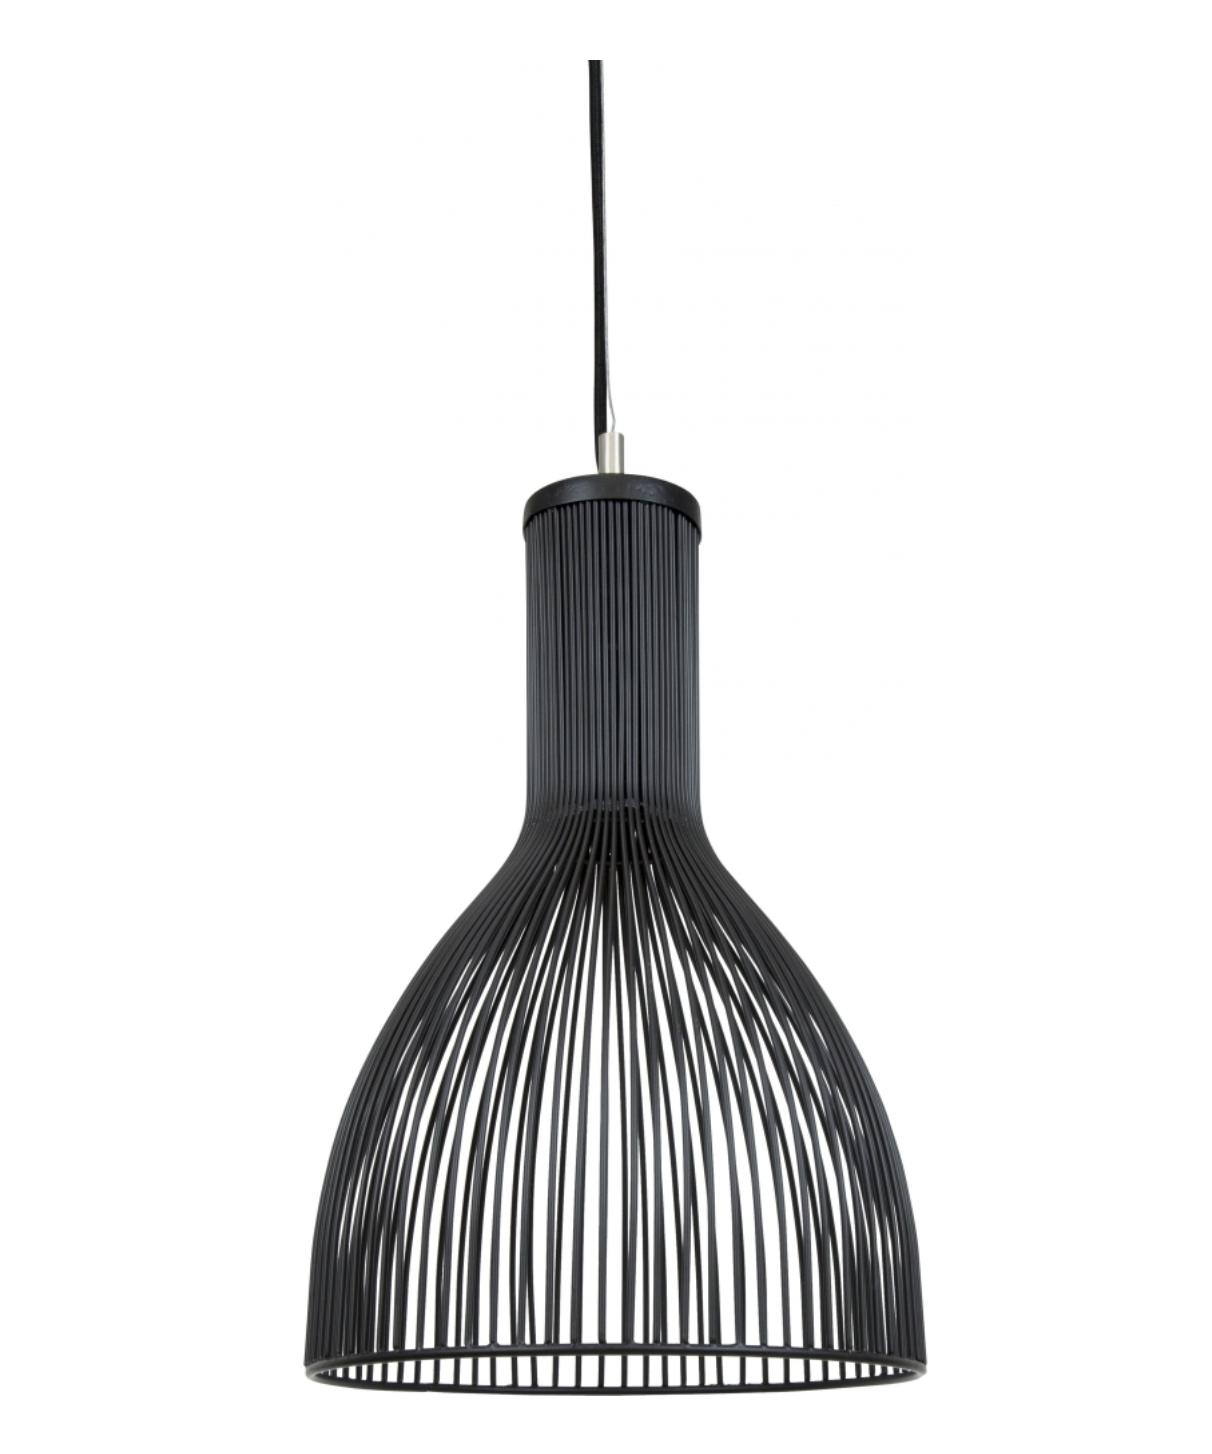 Small Teques Pendant Light | Lighting | Pinterest | Pendant lighting ...